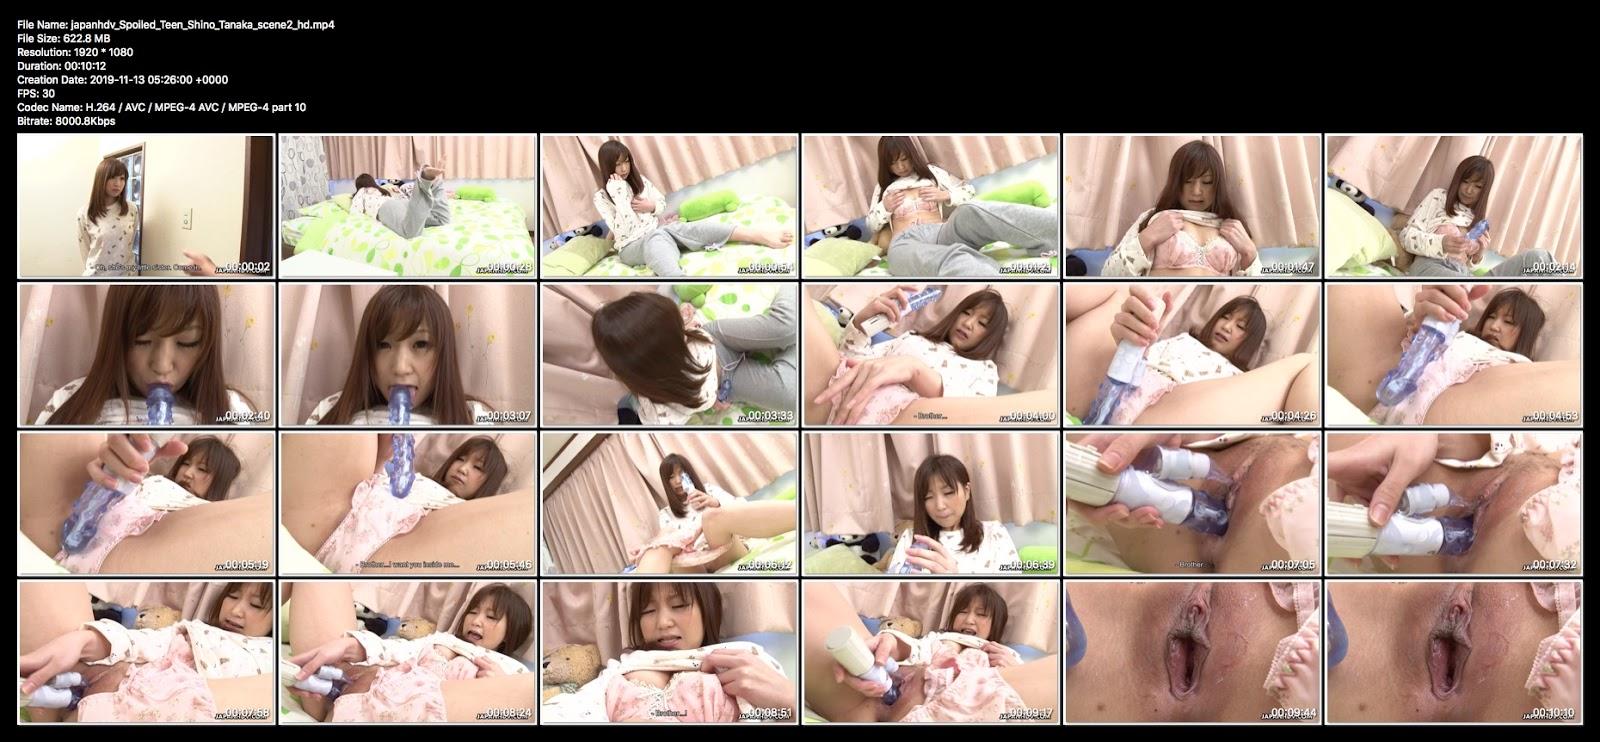 japanhdv Spoiled_Teen_Shino_Tanaka_scene2_hd japanhdv_Spoiled_Teen_Shino_Tanaka_scene2_hd